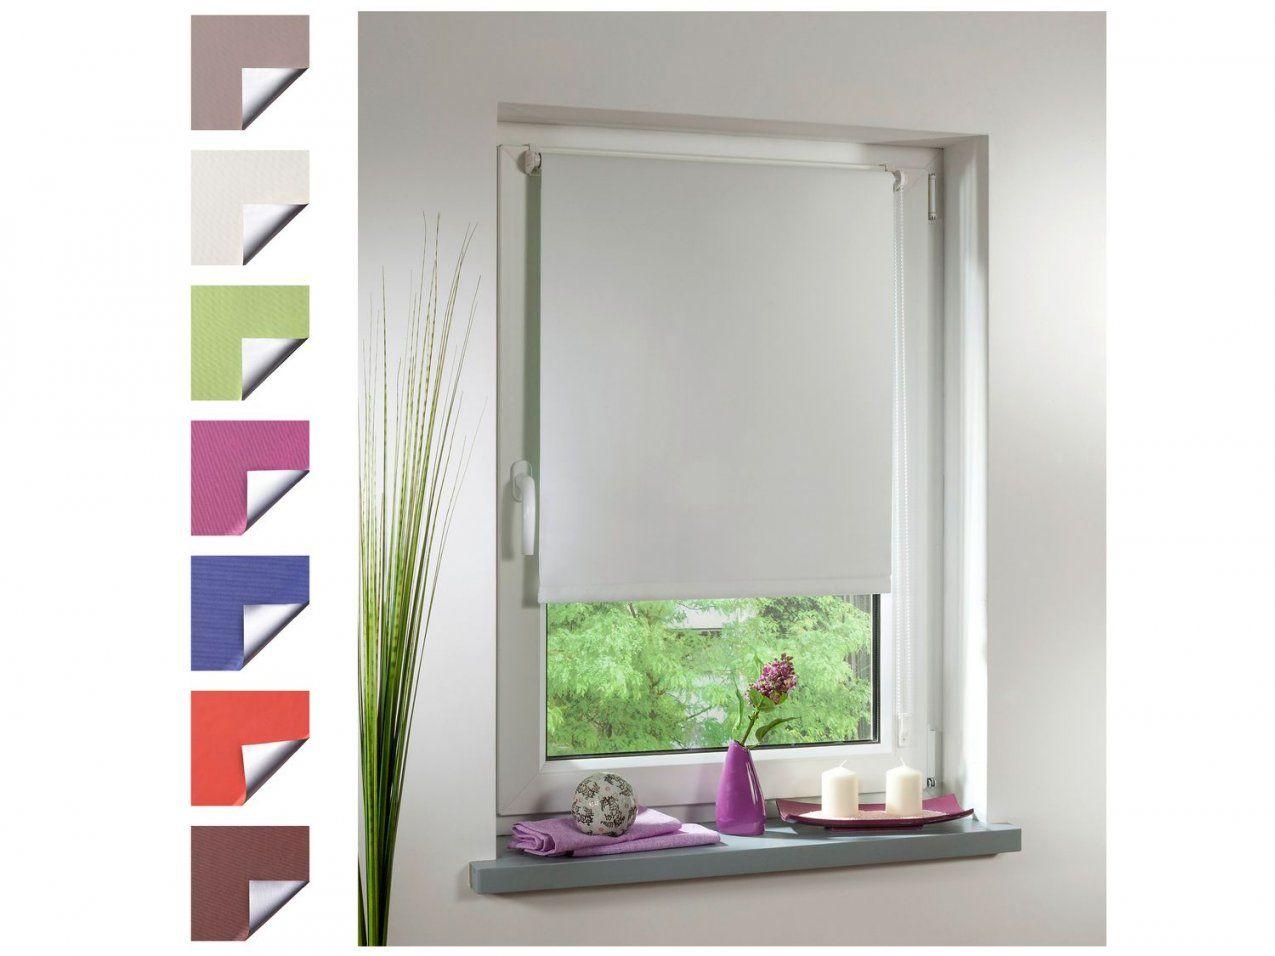 Sonnenschutz fenster innen ohne bohren haus design ideen - Fenster verdunkelung innen ...